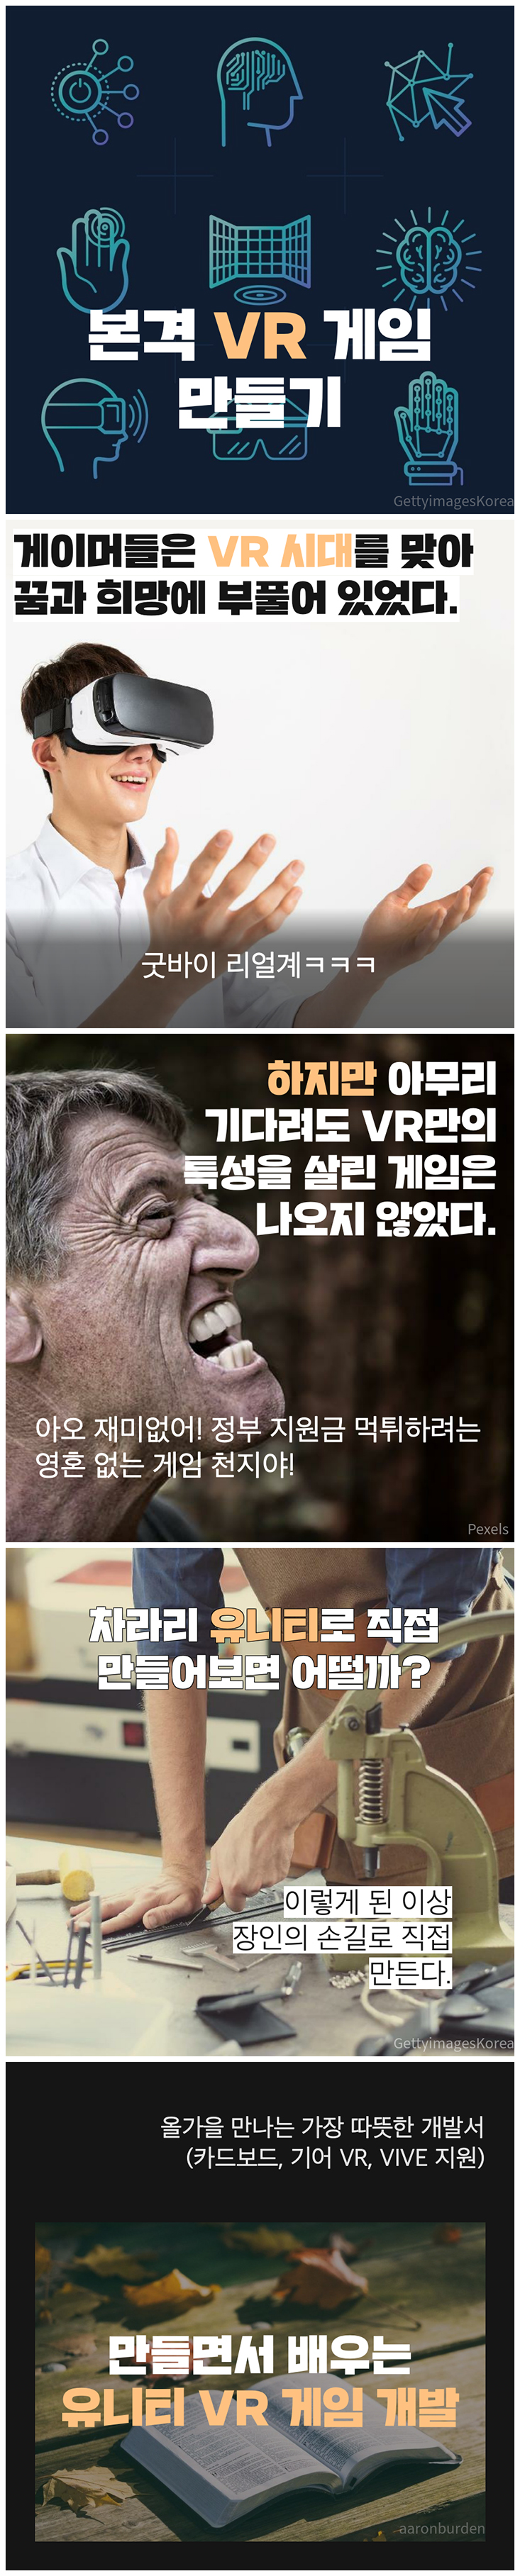 tyle-rh1-vertical_733.jpg